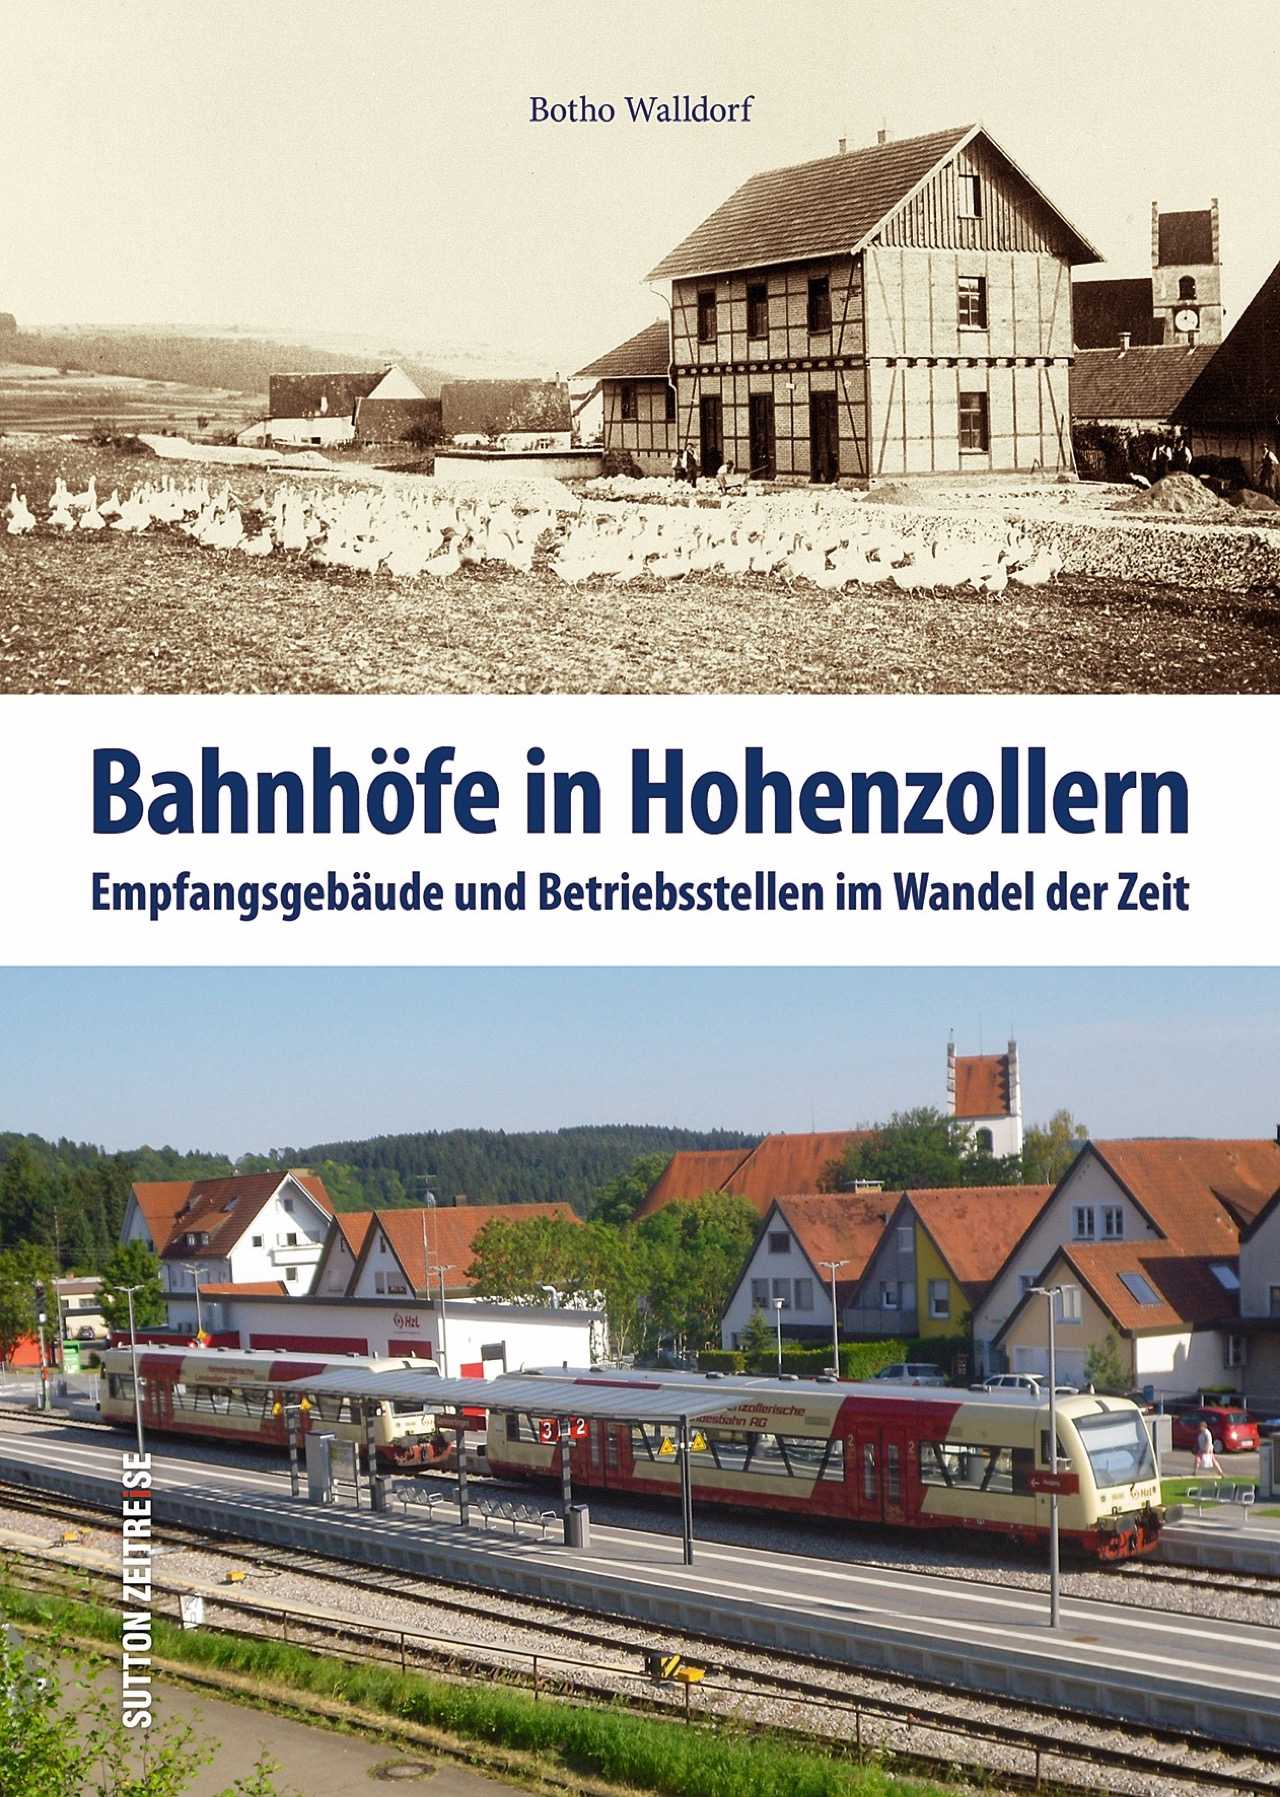 Bahnhöfe in Hohenzollern